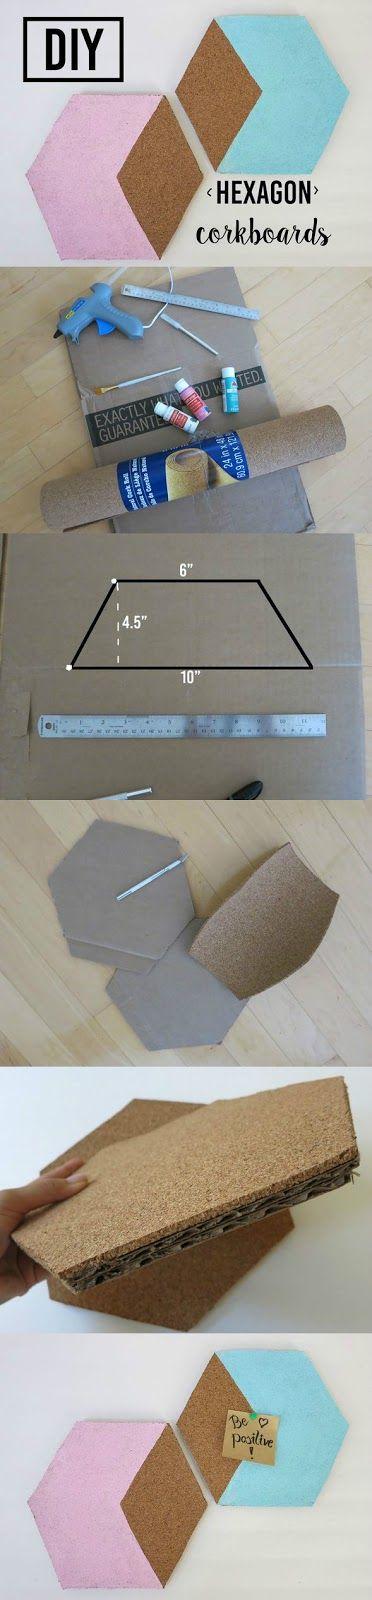 Vibrant Vantage: DIY Hexagon Corkboards/Bulletin Boards